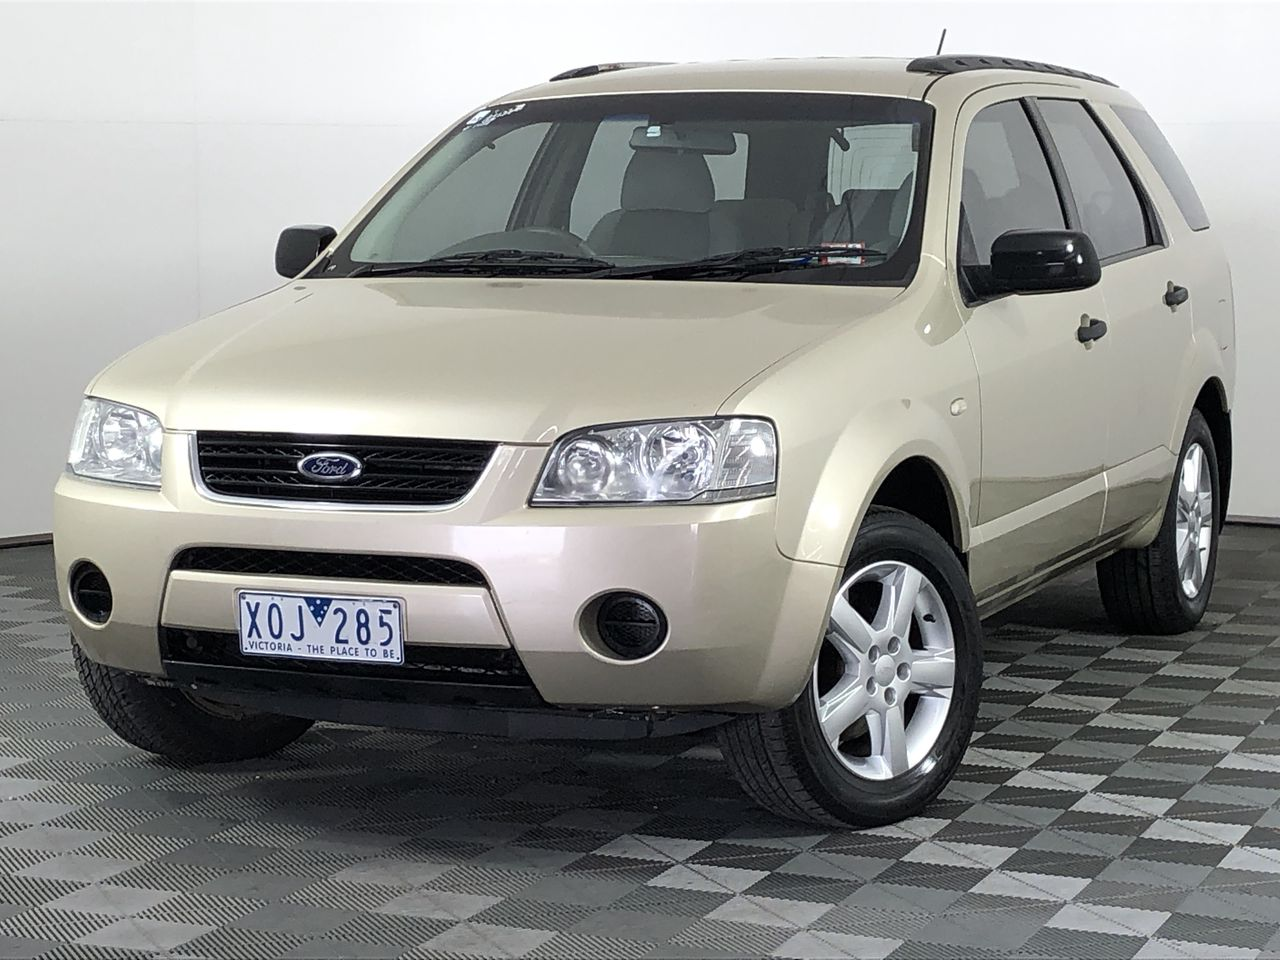 2007 Ford Territory TS (RWD) SY Automatic 7 Seats Wagon